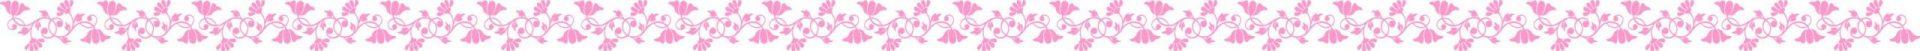 faixa de rosas